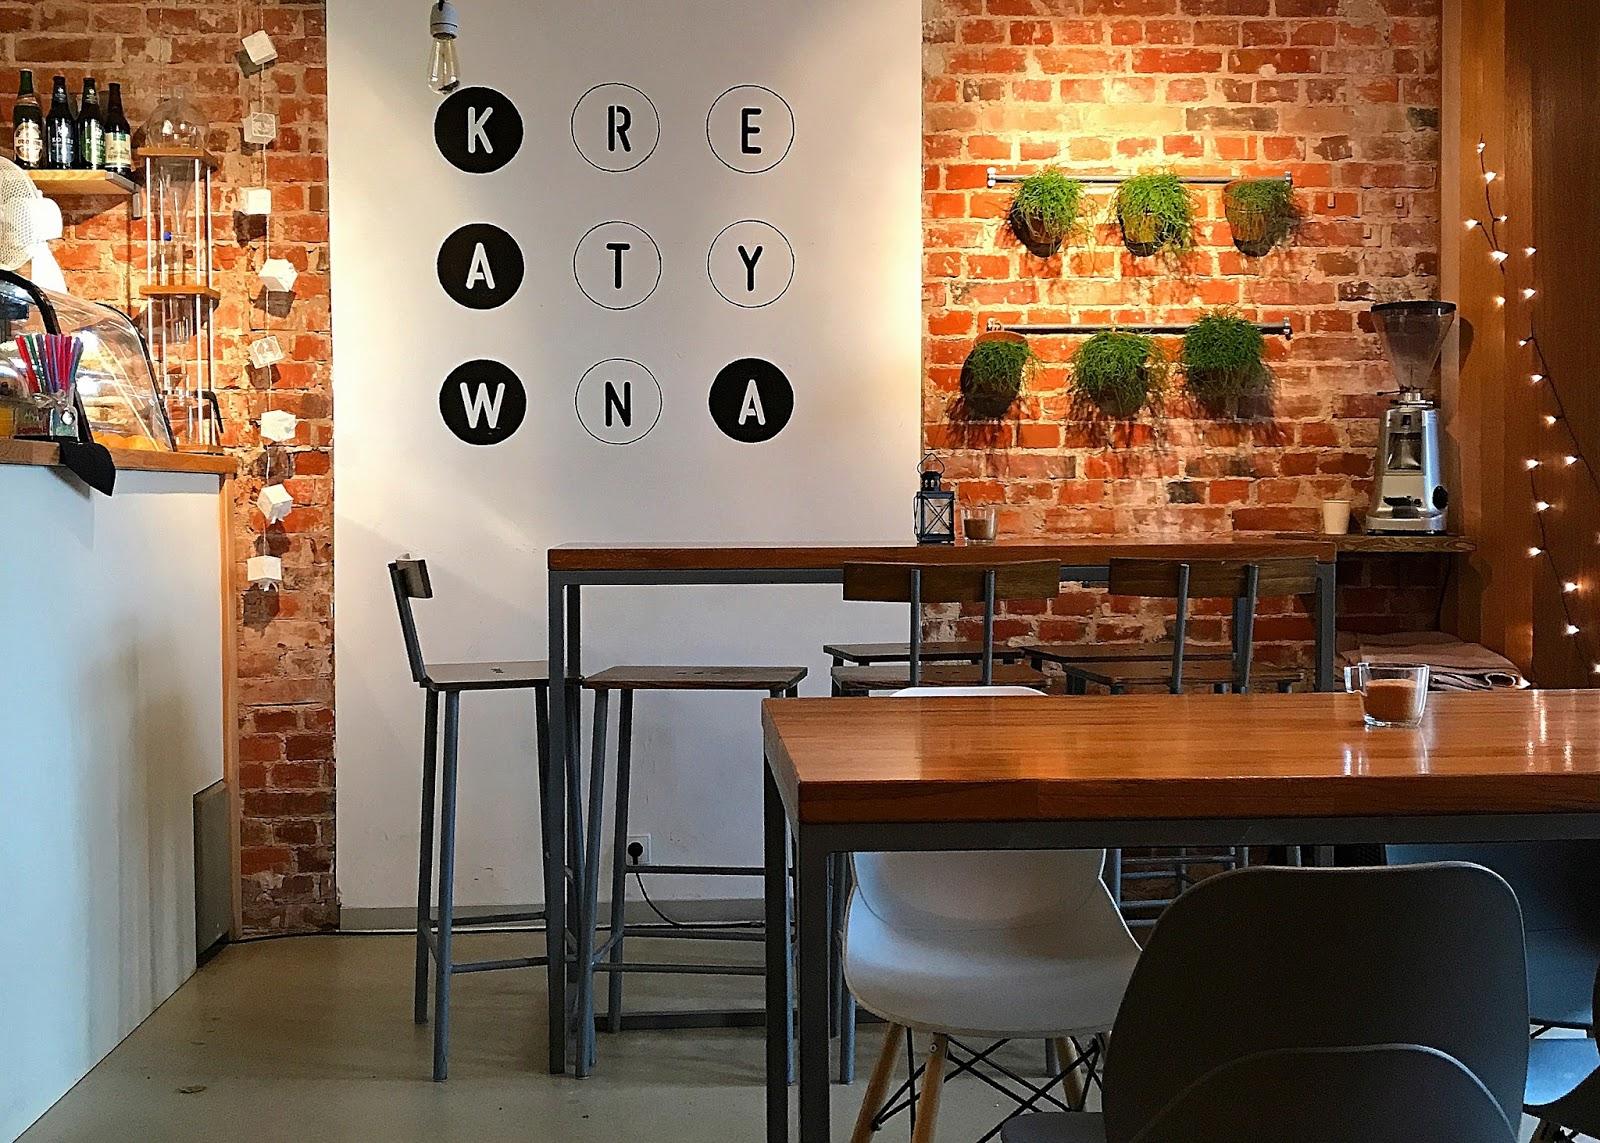 Kreatywna Cafe Gdańsk garnizon